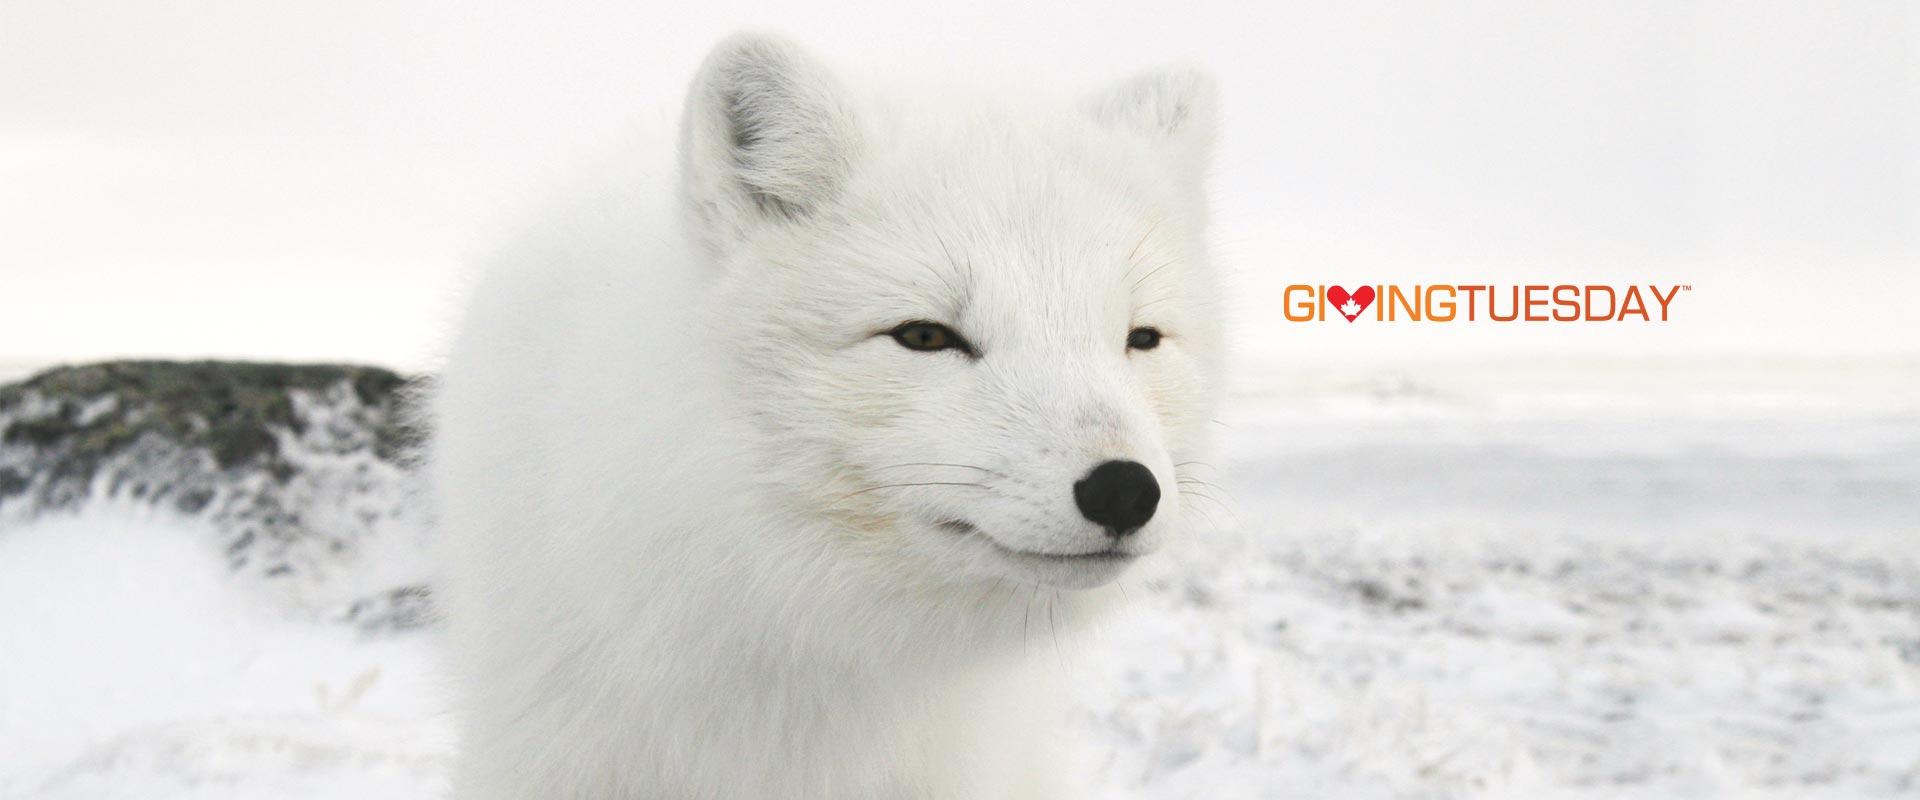 arctic fox giving tuesday